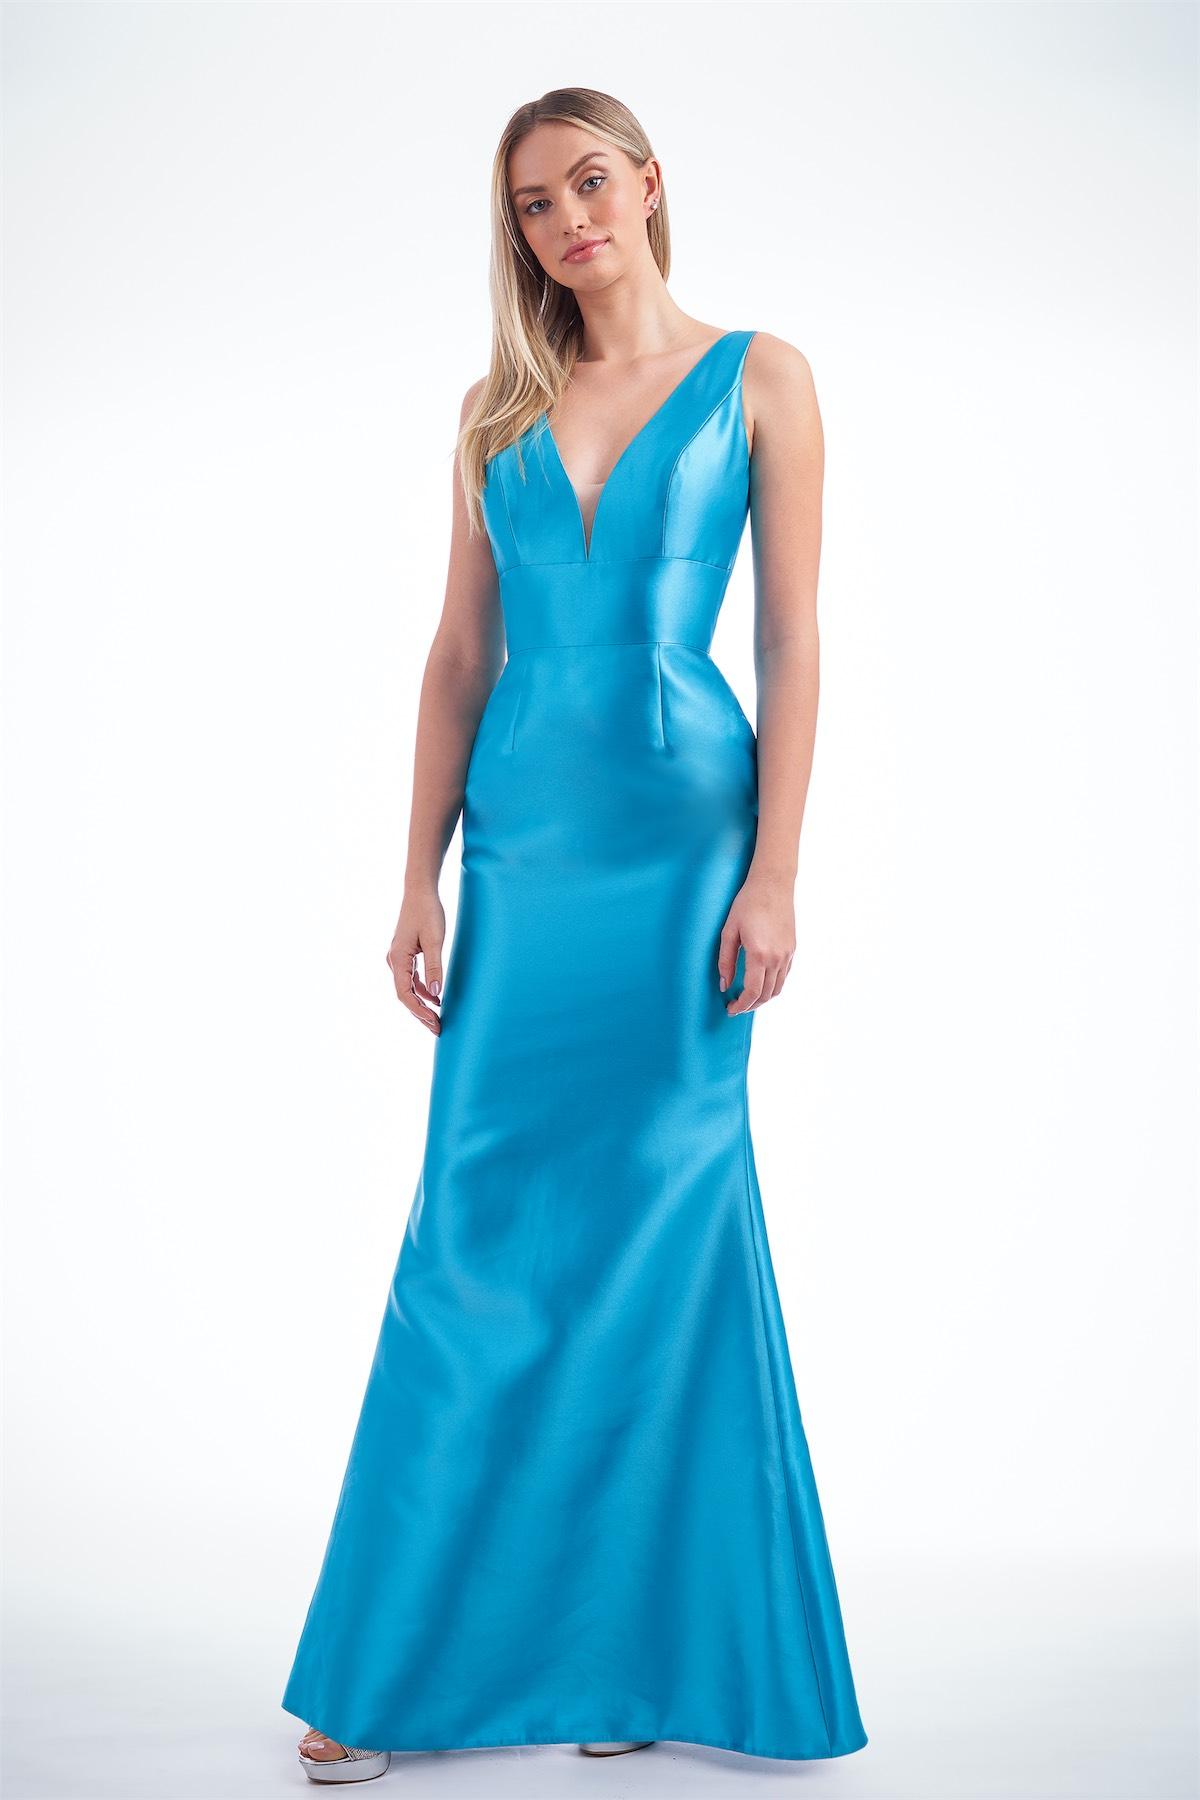 Slimming Bridesmaid Dresses